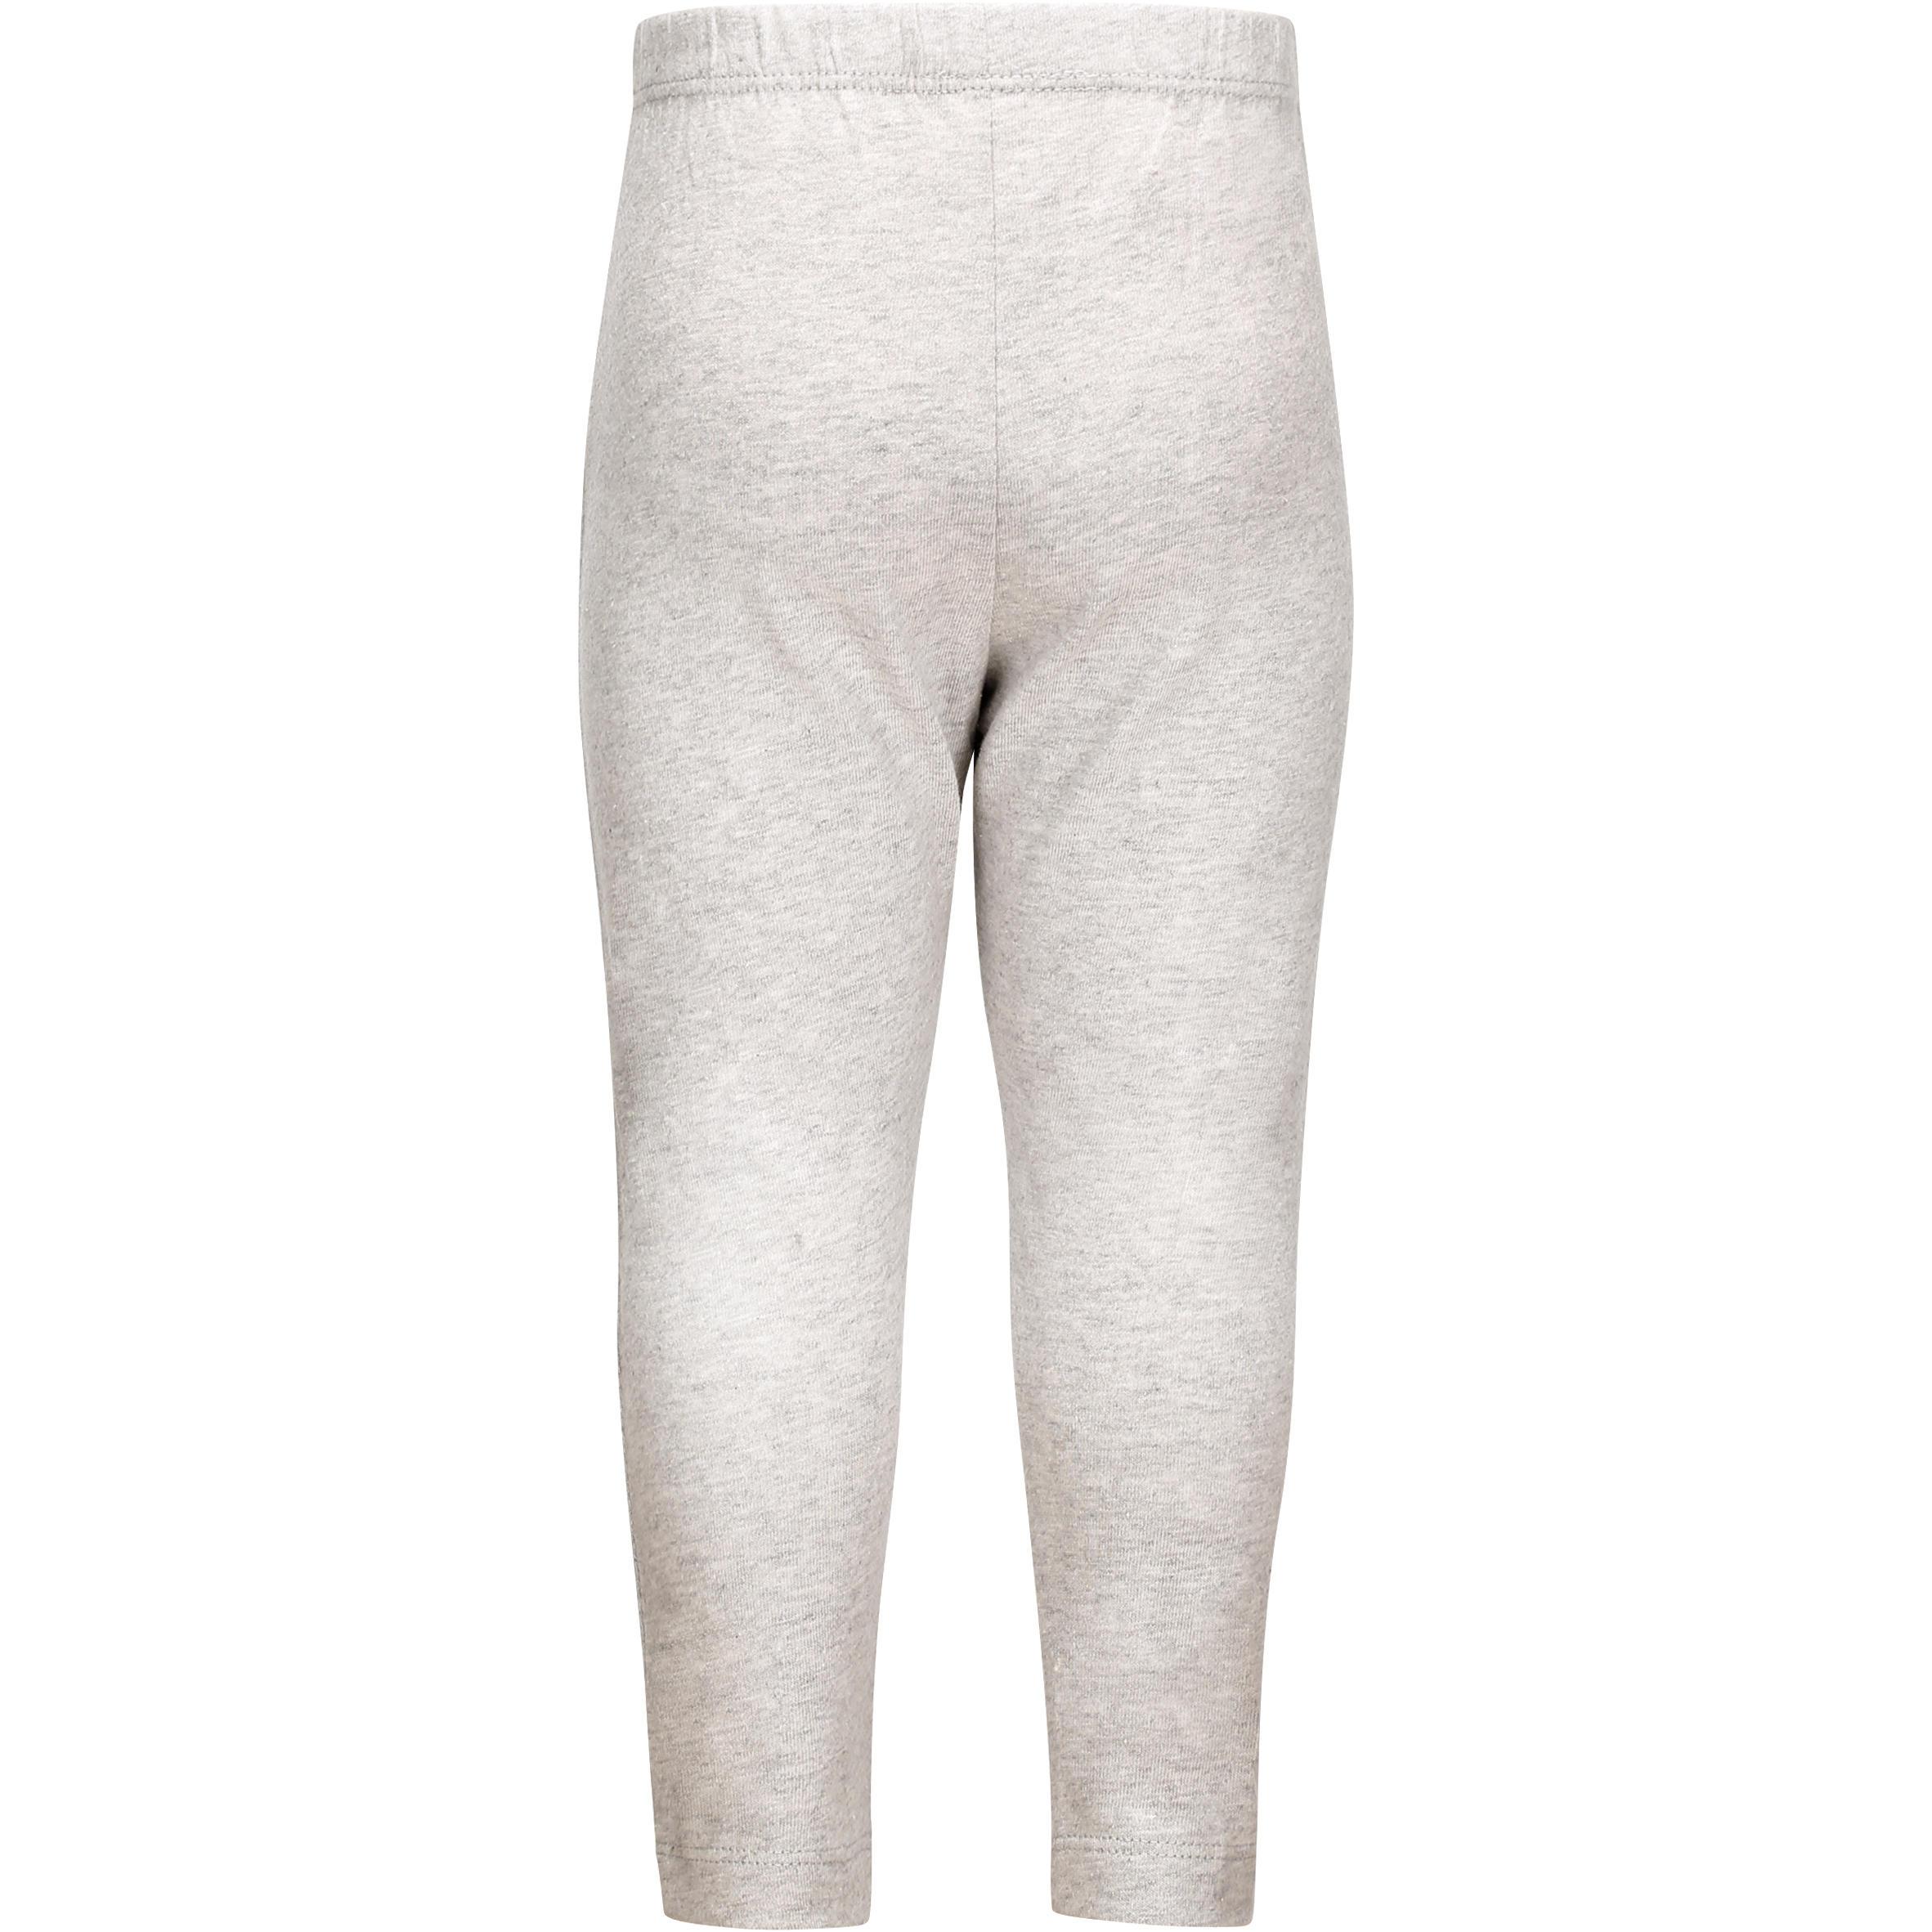 100 Lightweight Baby Gym Bottoms - Grey